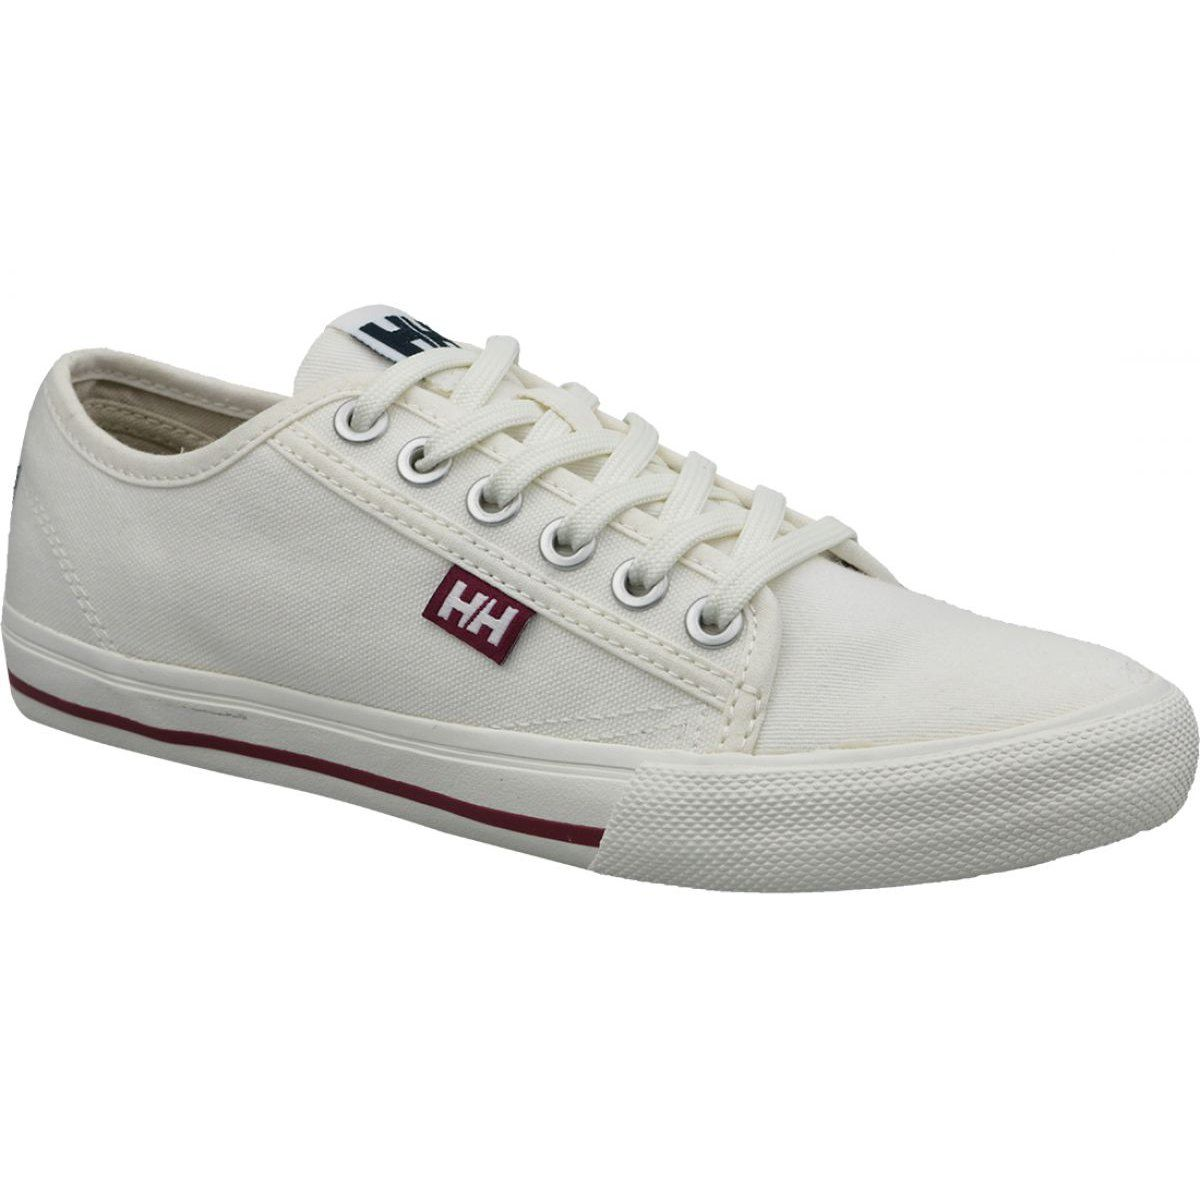 Buty Helly Hansen Fjord Canvas Shoe V2 W 11466 011 Biale Canvas Shoes Slim Fit Boots Women Platform Shoes